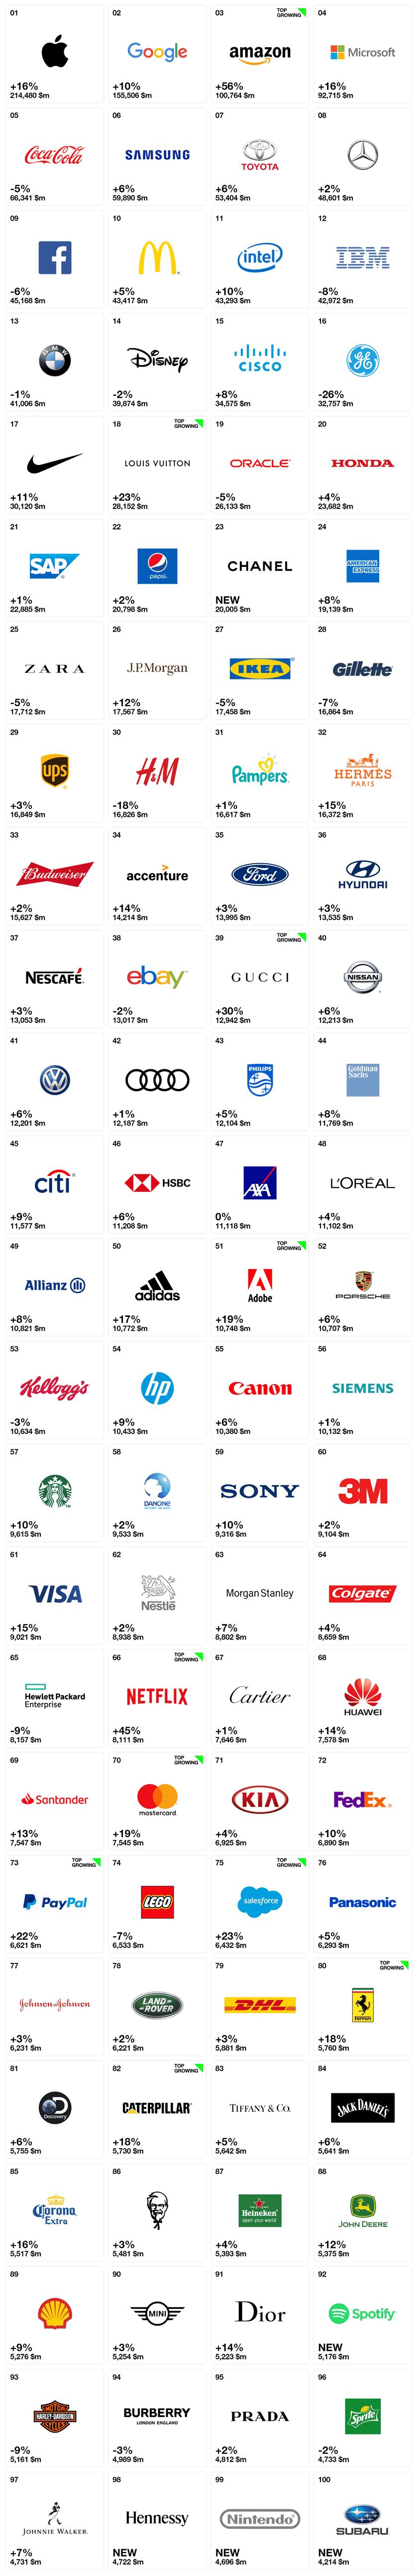 Interbrand發布2018年最佳全球品牌報告,蘋果蟬聯冠軍